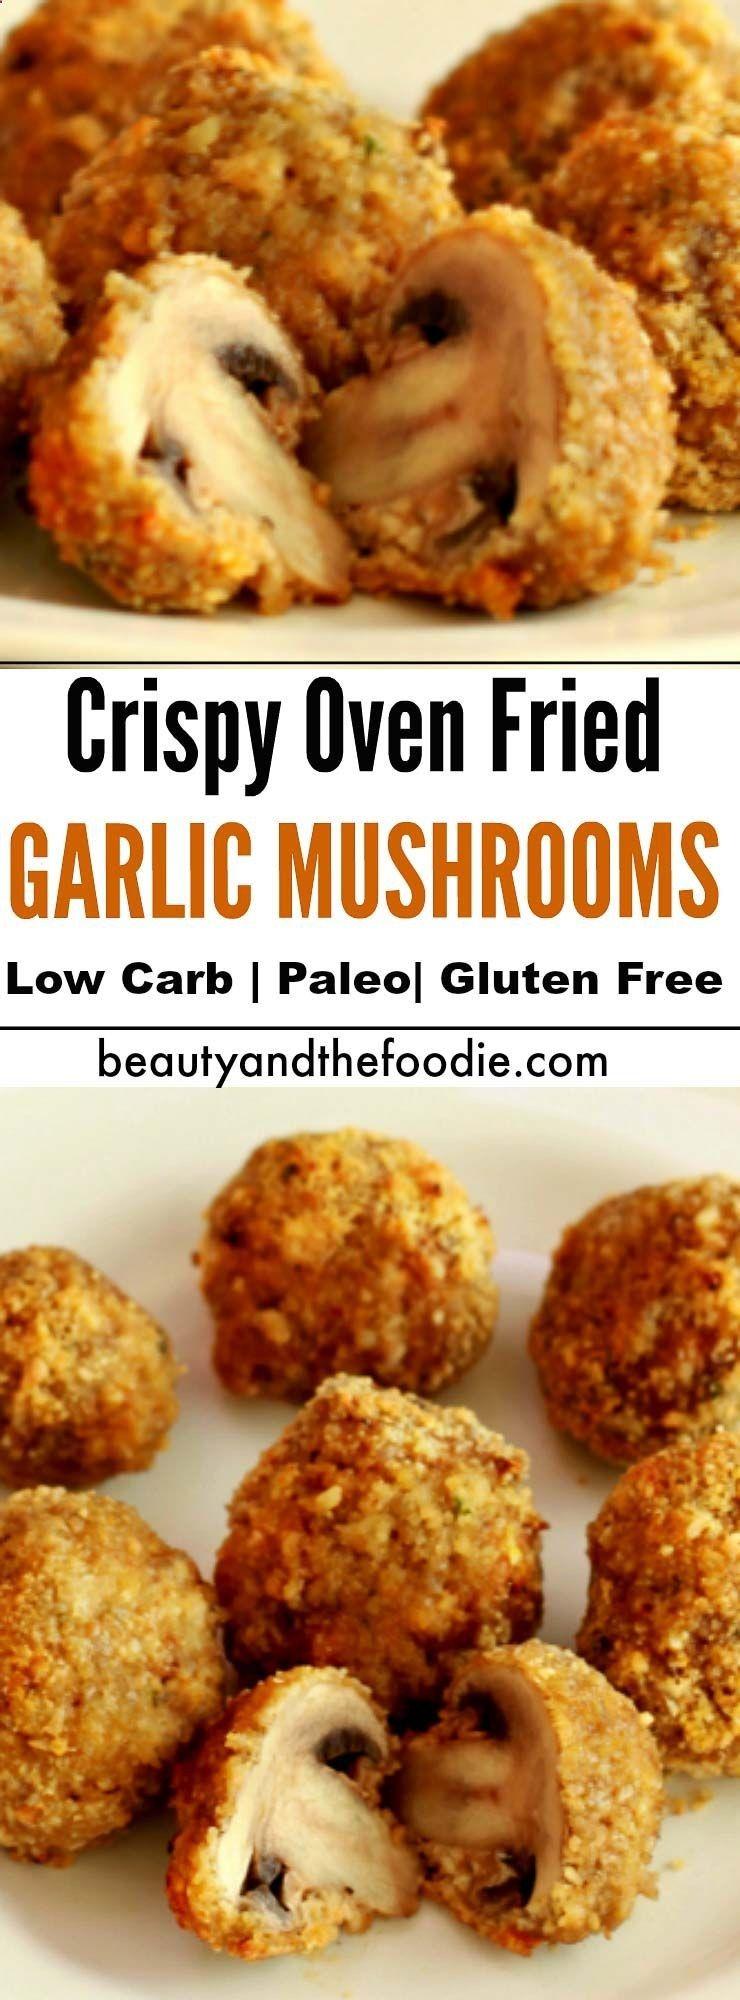 Crispy oven fried garlic mushrooms low carb paleo